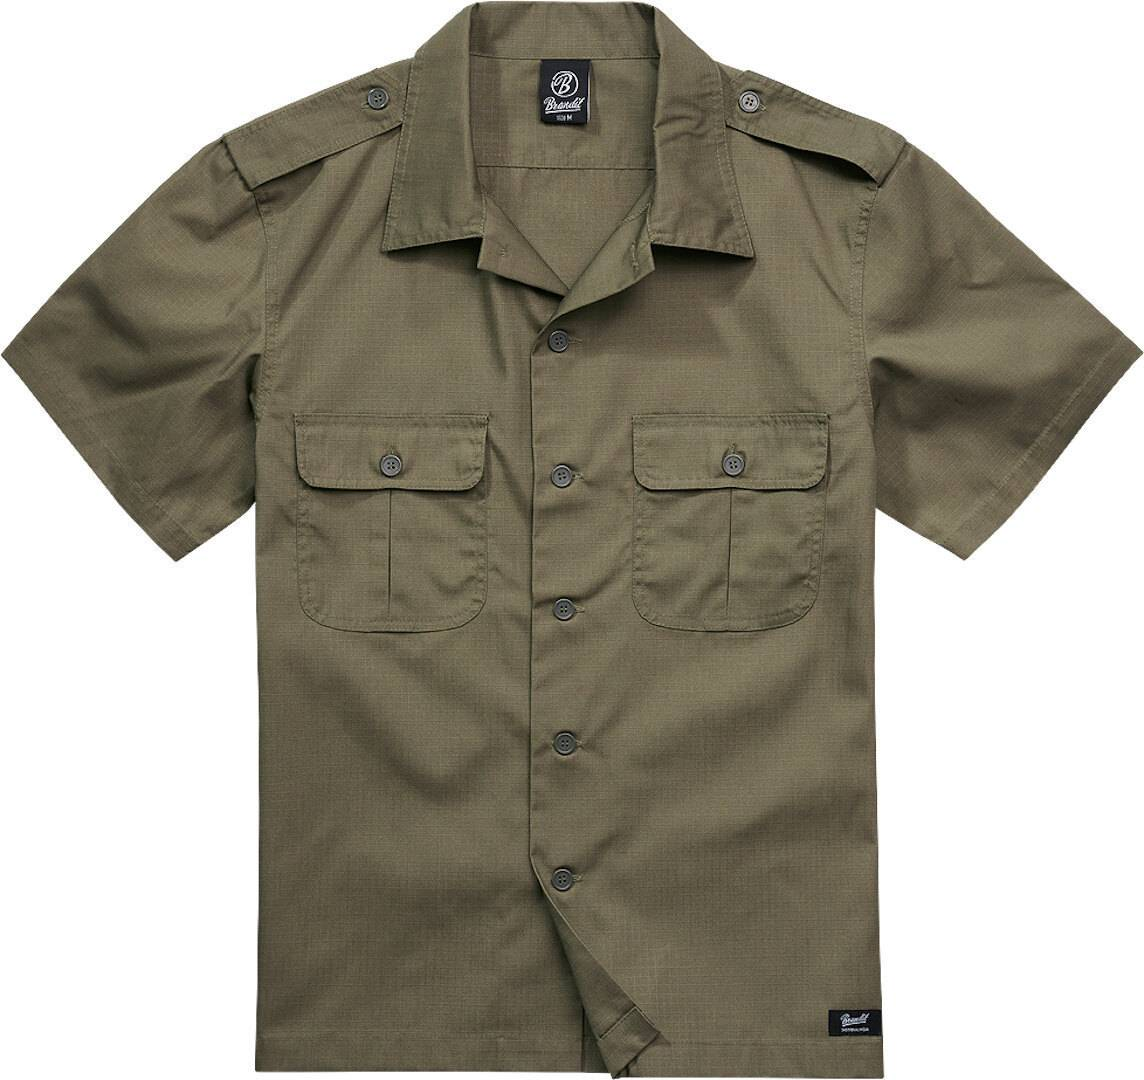 Brandit US Ripstop Paita  - Vihreä - Size: 4XL